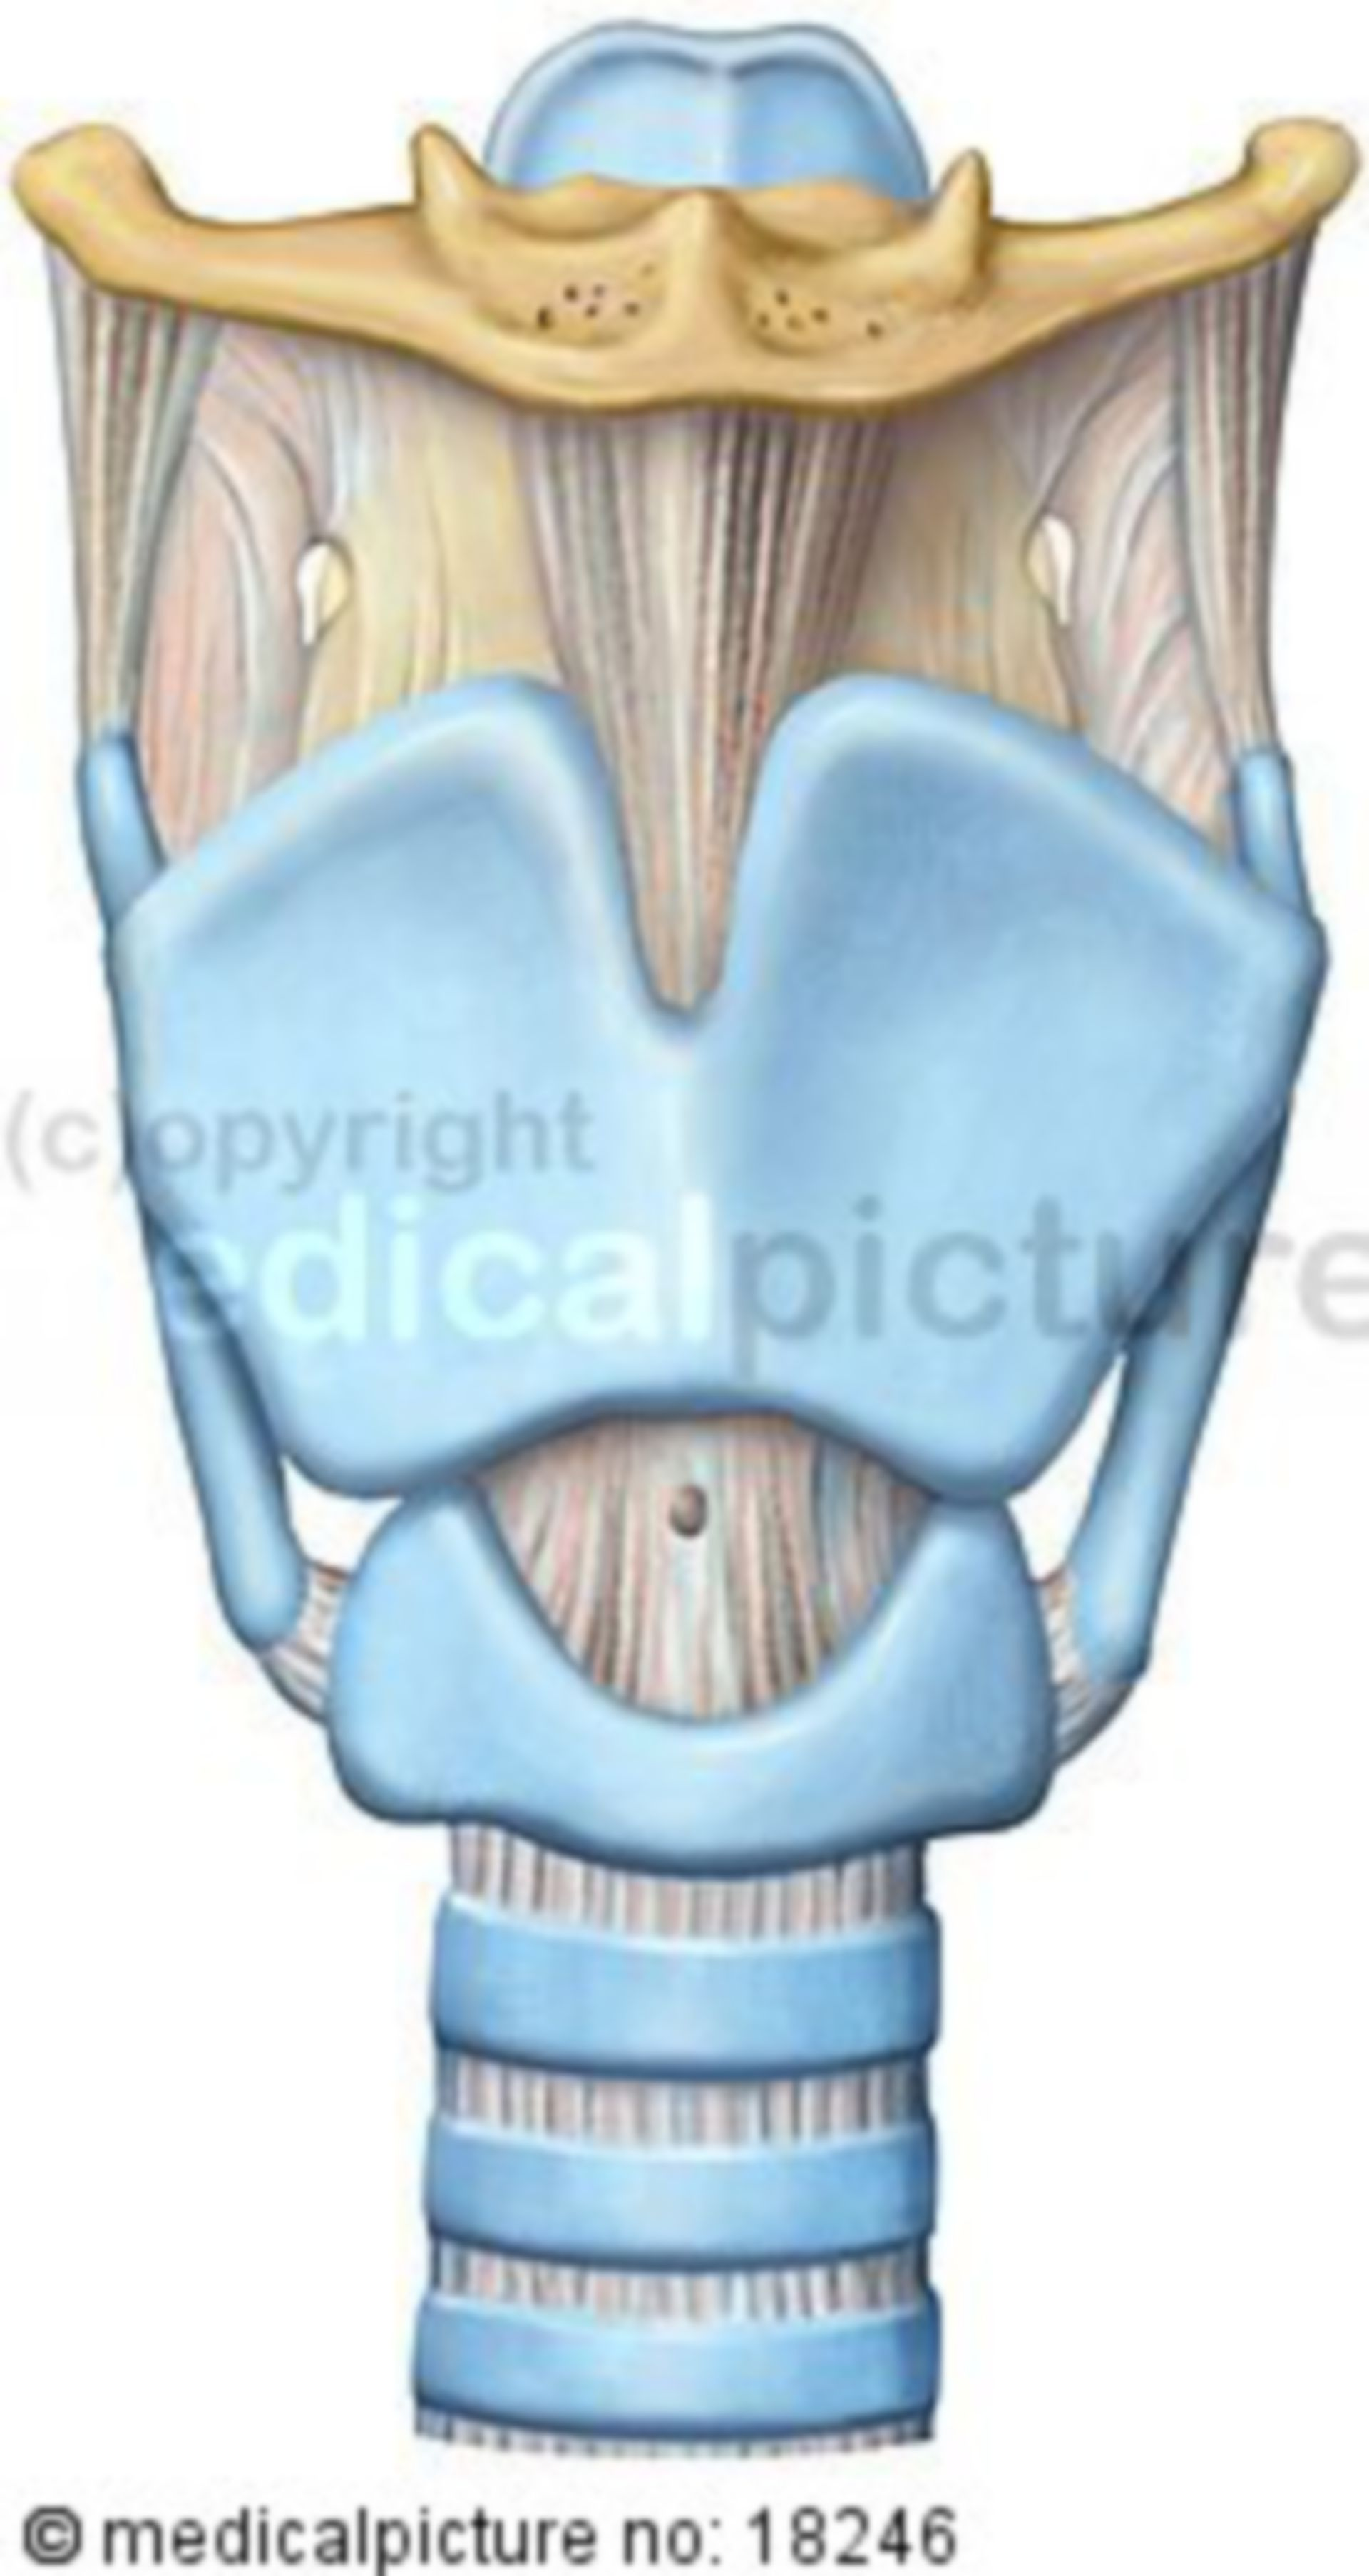 Kehlkopf, Larynx